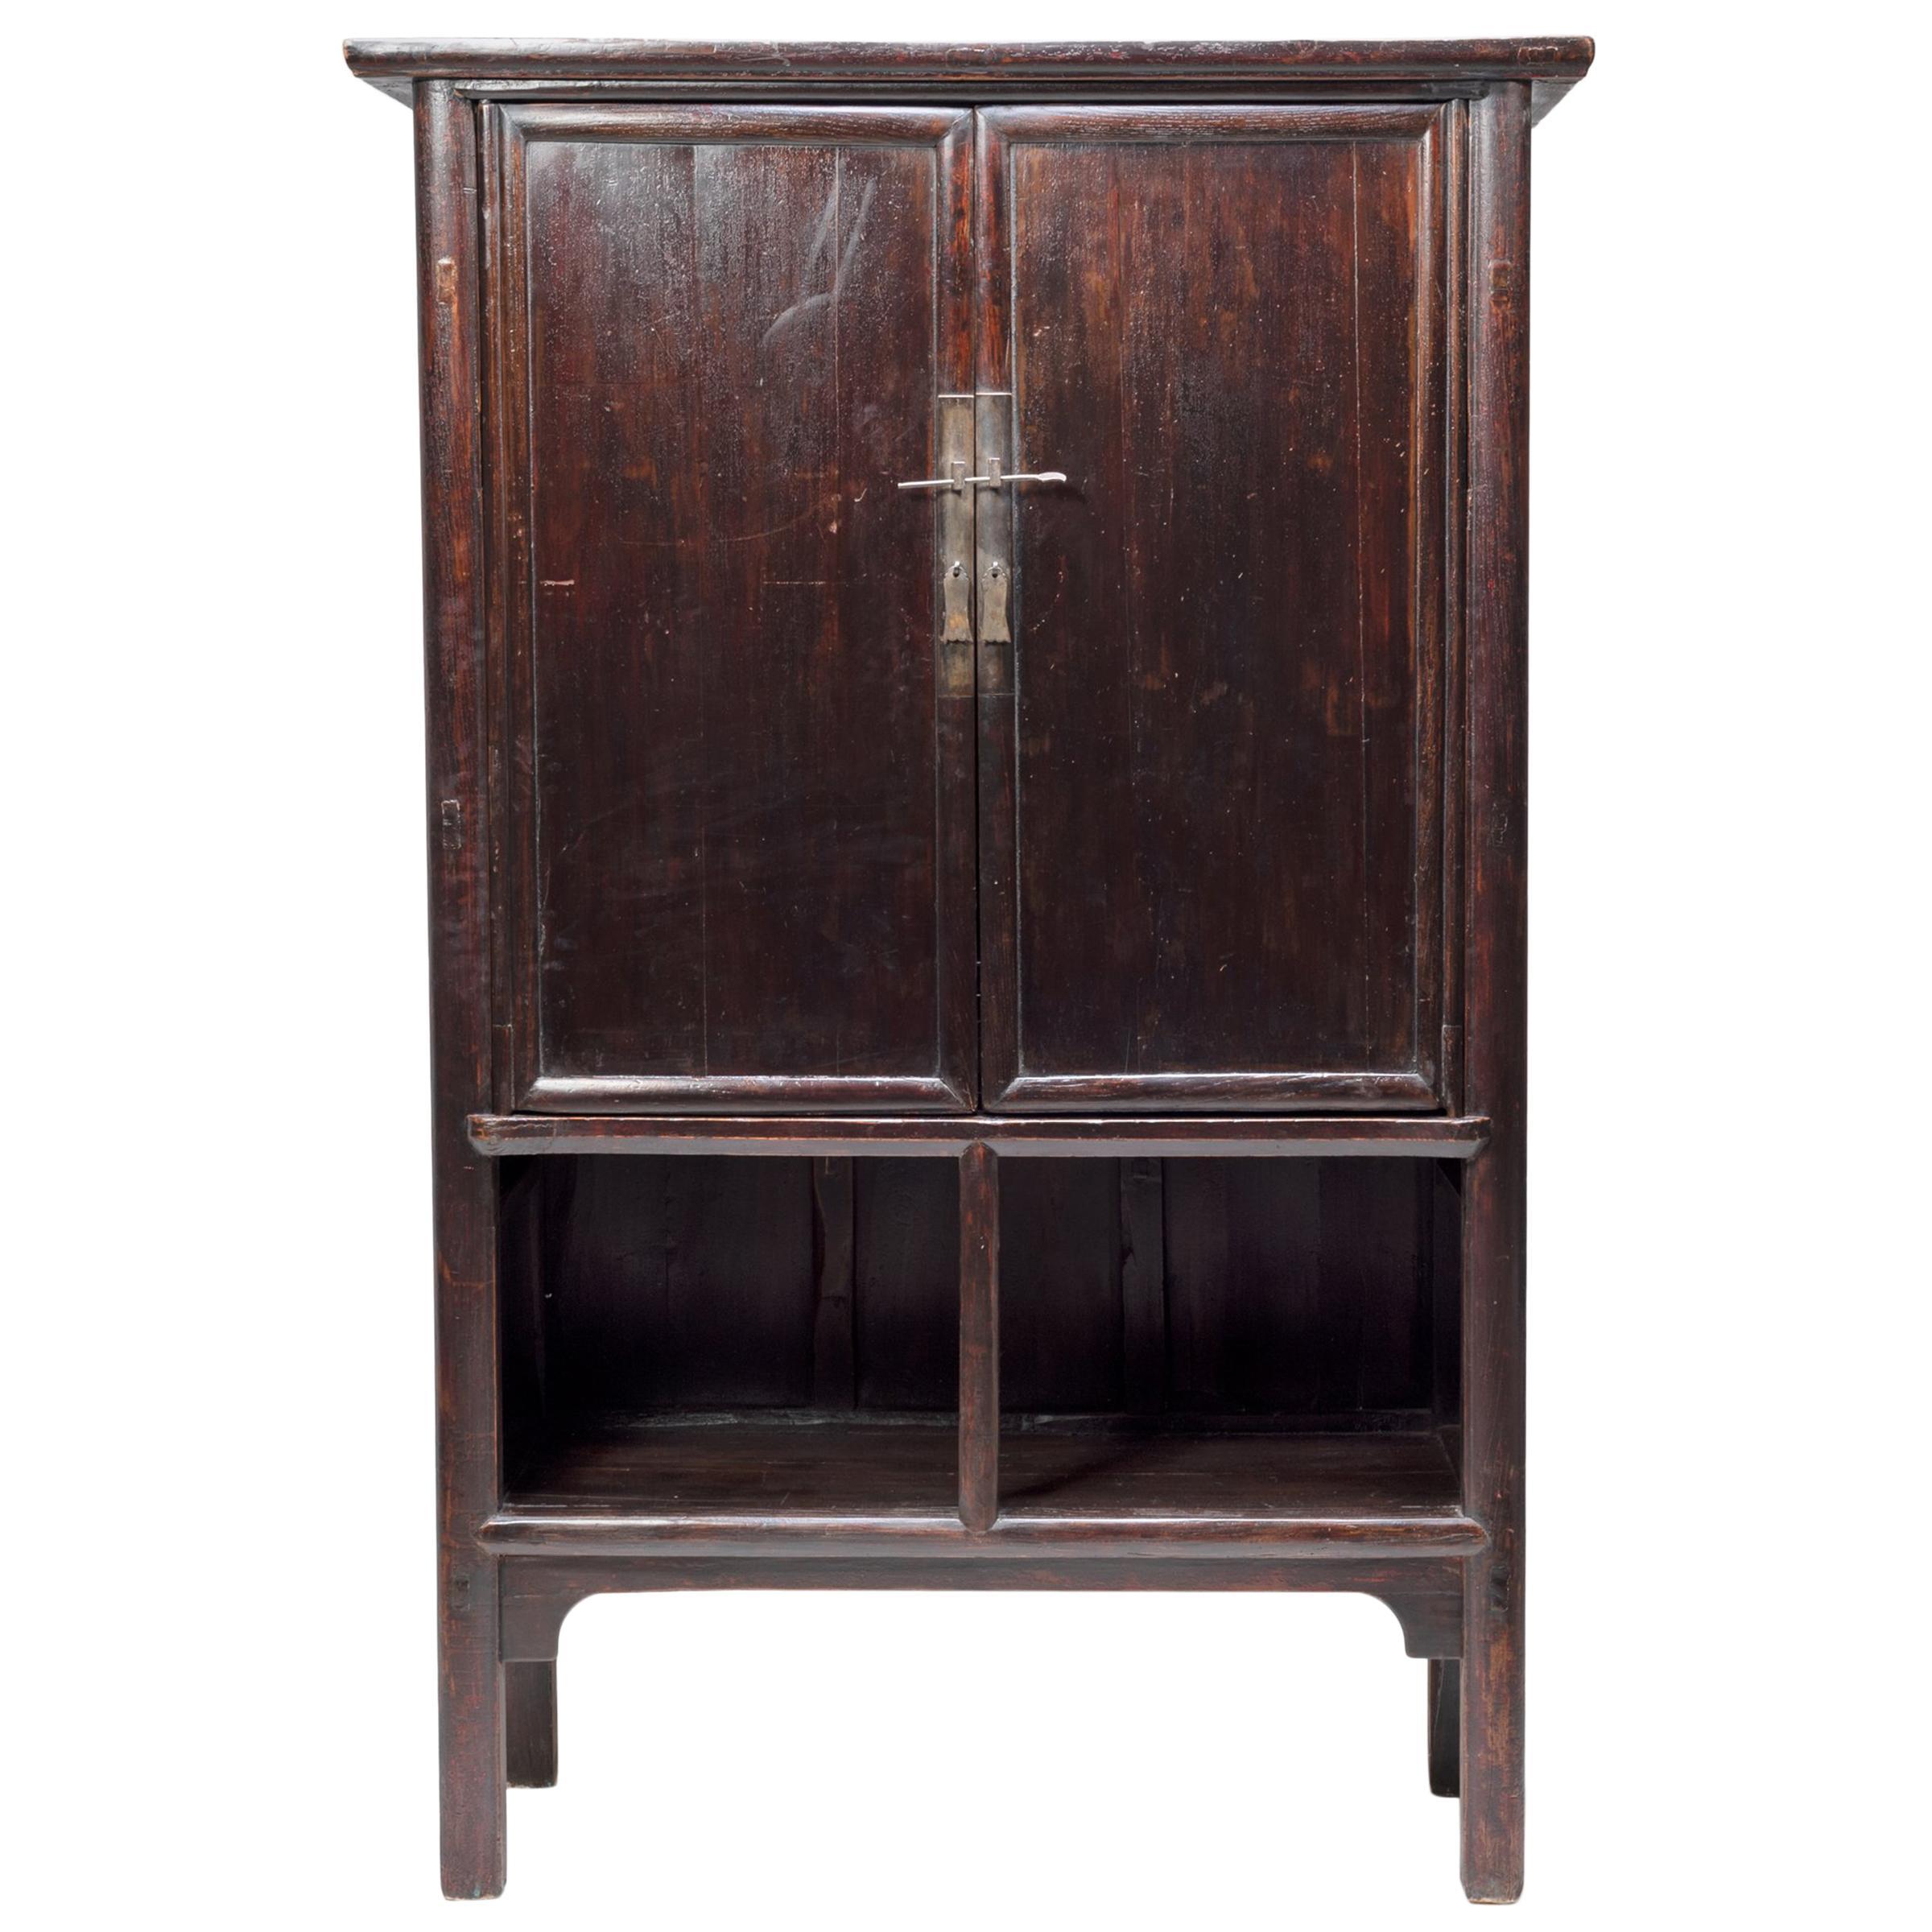 Chinese Two-Door Cabinet, c. 1850